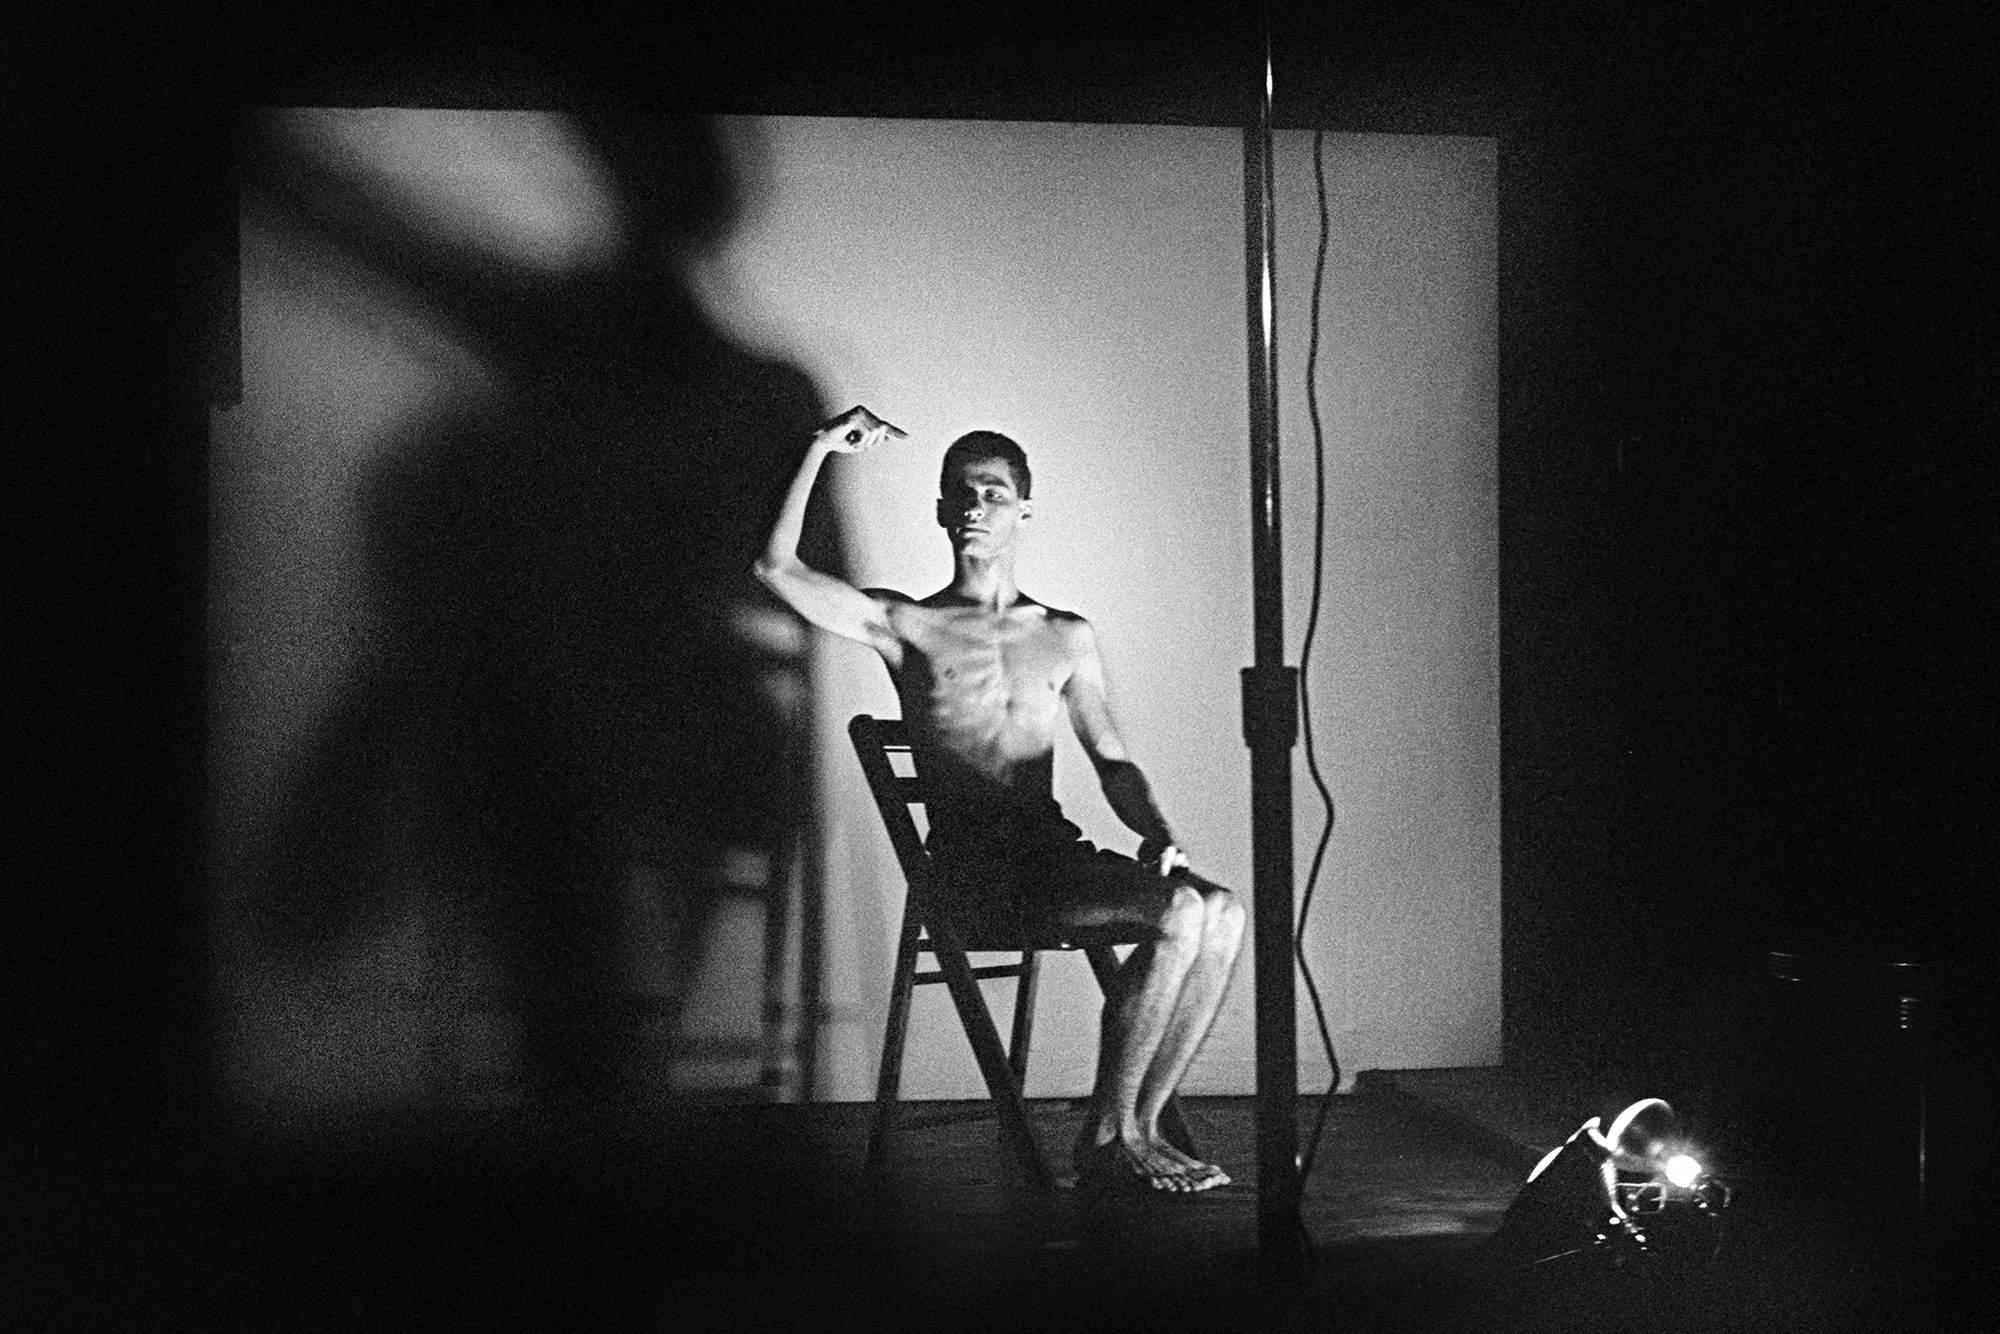 Club 57 Film, Performance, and